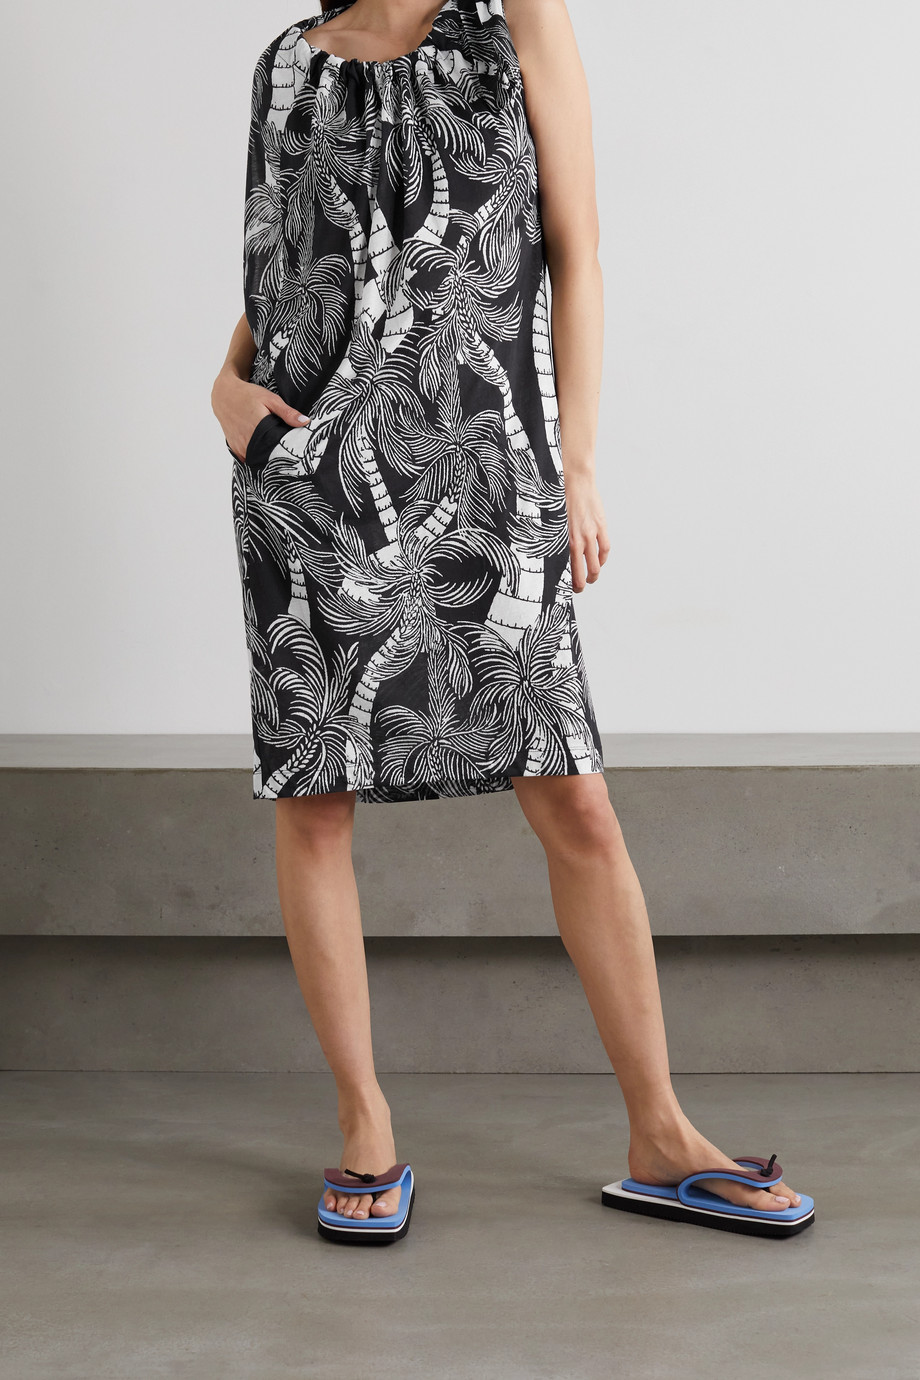 Dries Van Noten Gathered printed cotton-jersey dress